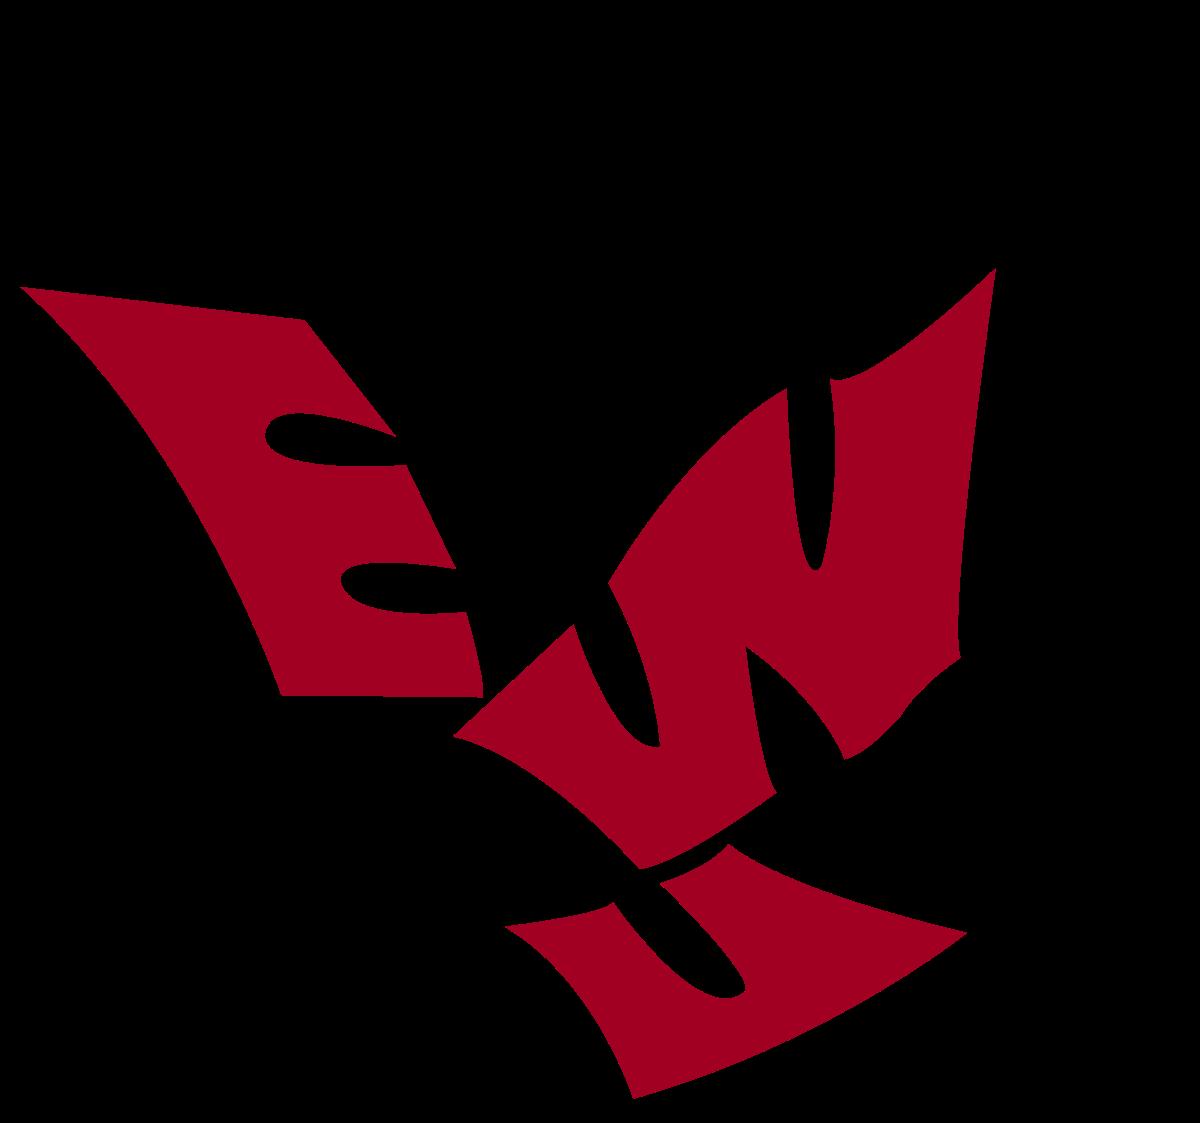 Eastern eagles wikipedia . Husky clipart washington university